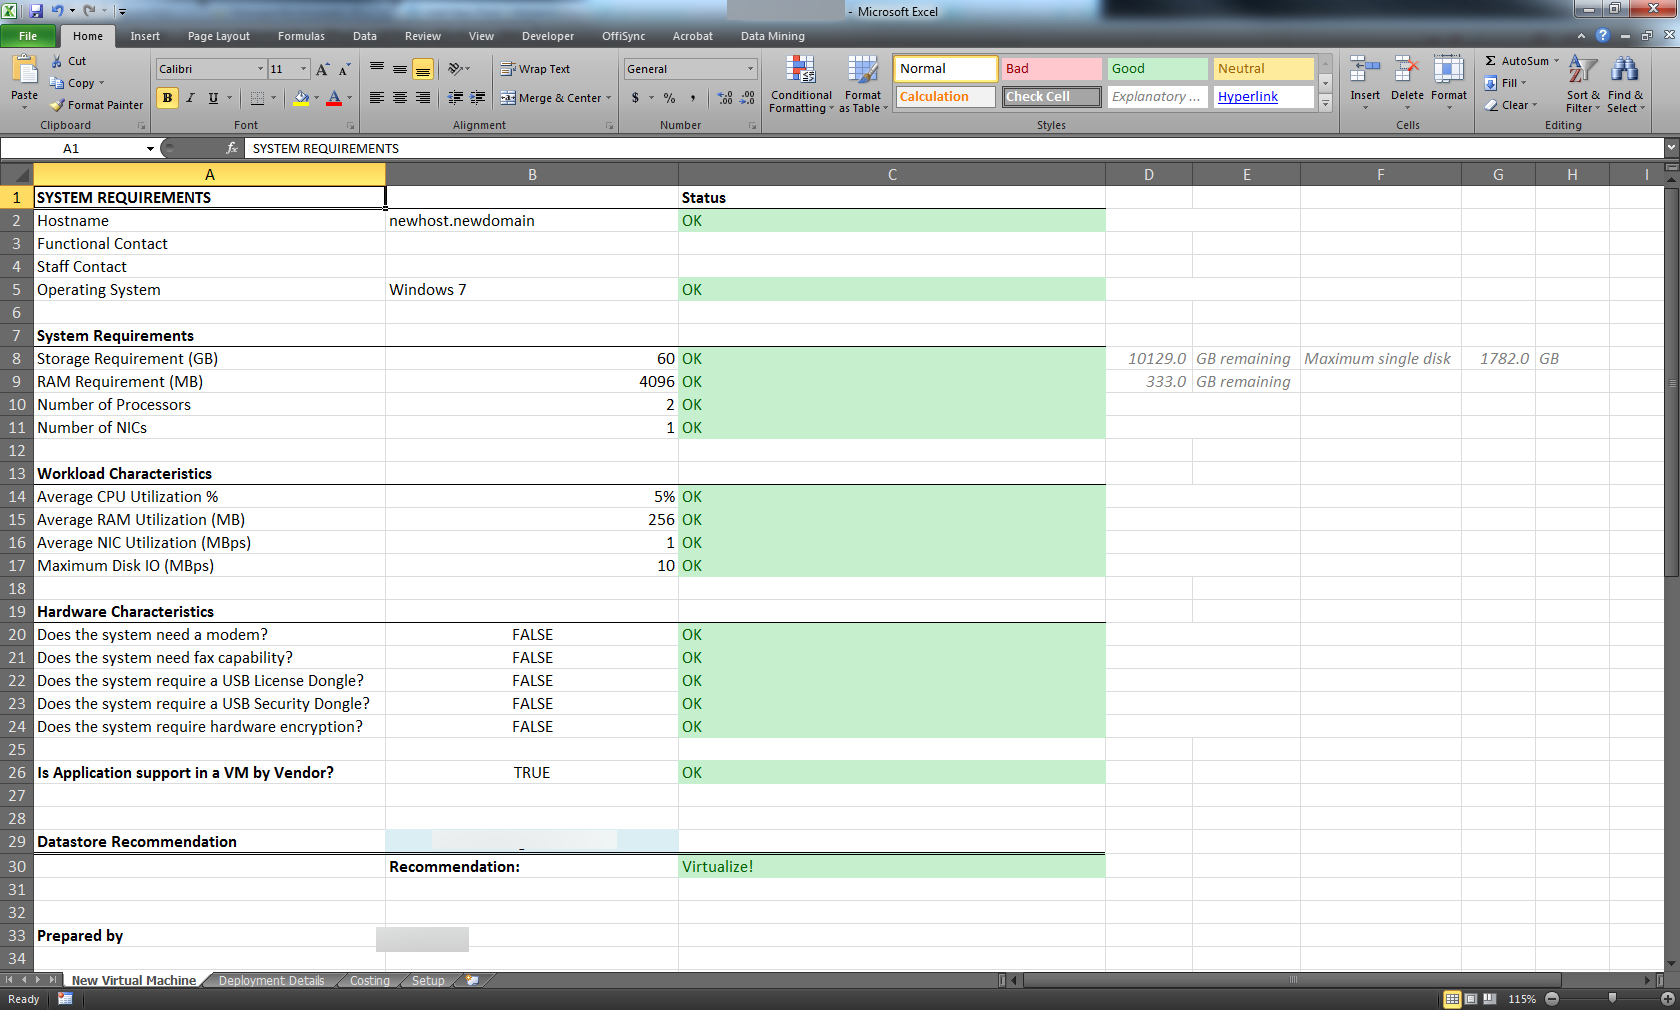 Vmware Capacity Planning Spreadsheet Spreadsheet Downloa